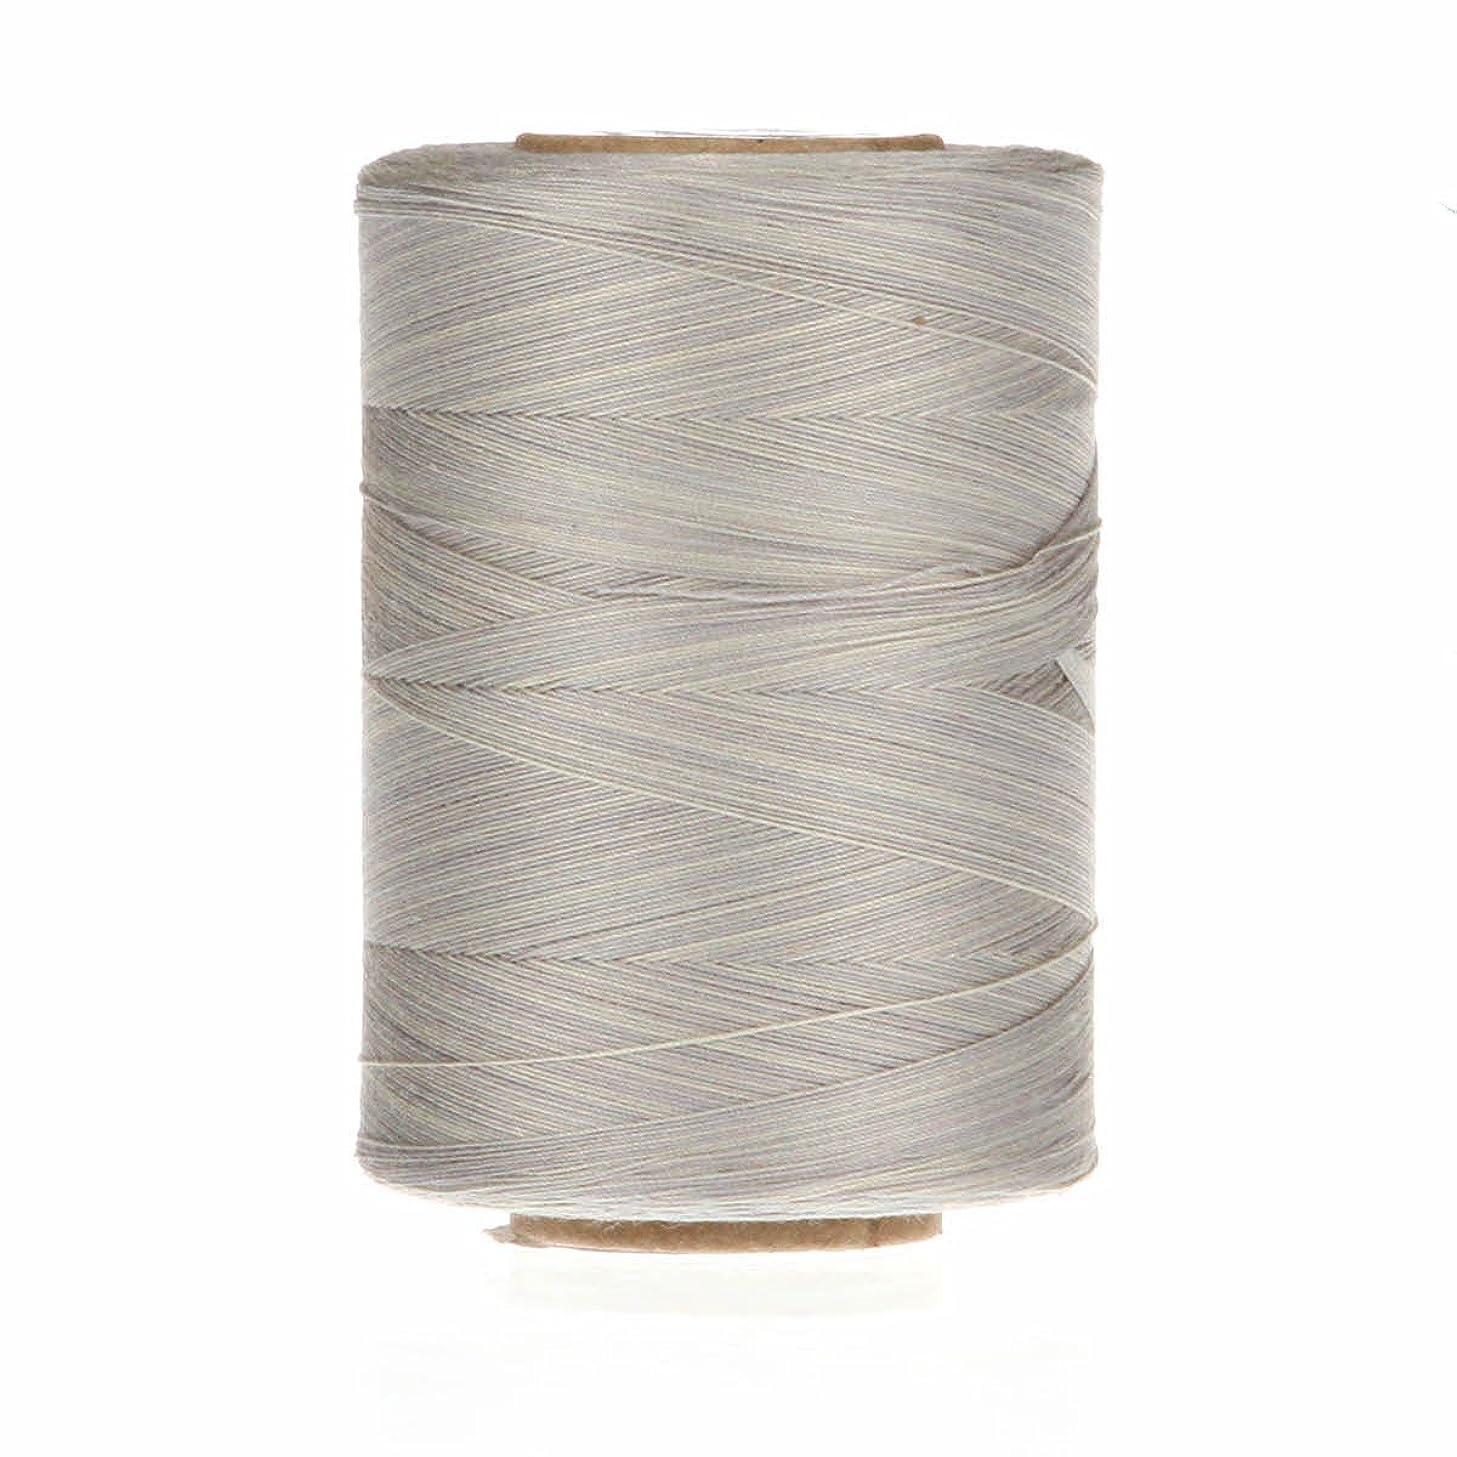 Star Thread V38-0857 3-Ply 30wt T-35 Cotton Quilting & Craft Variegated Thread, 1200 yd, Silver Lining